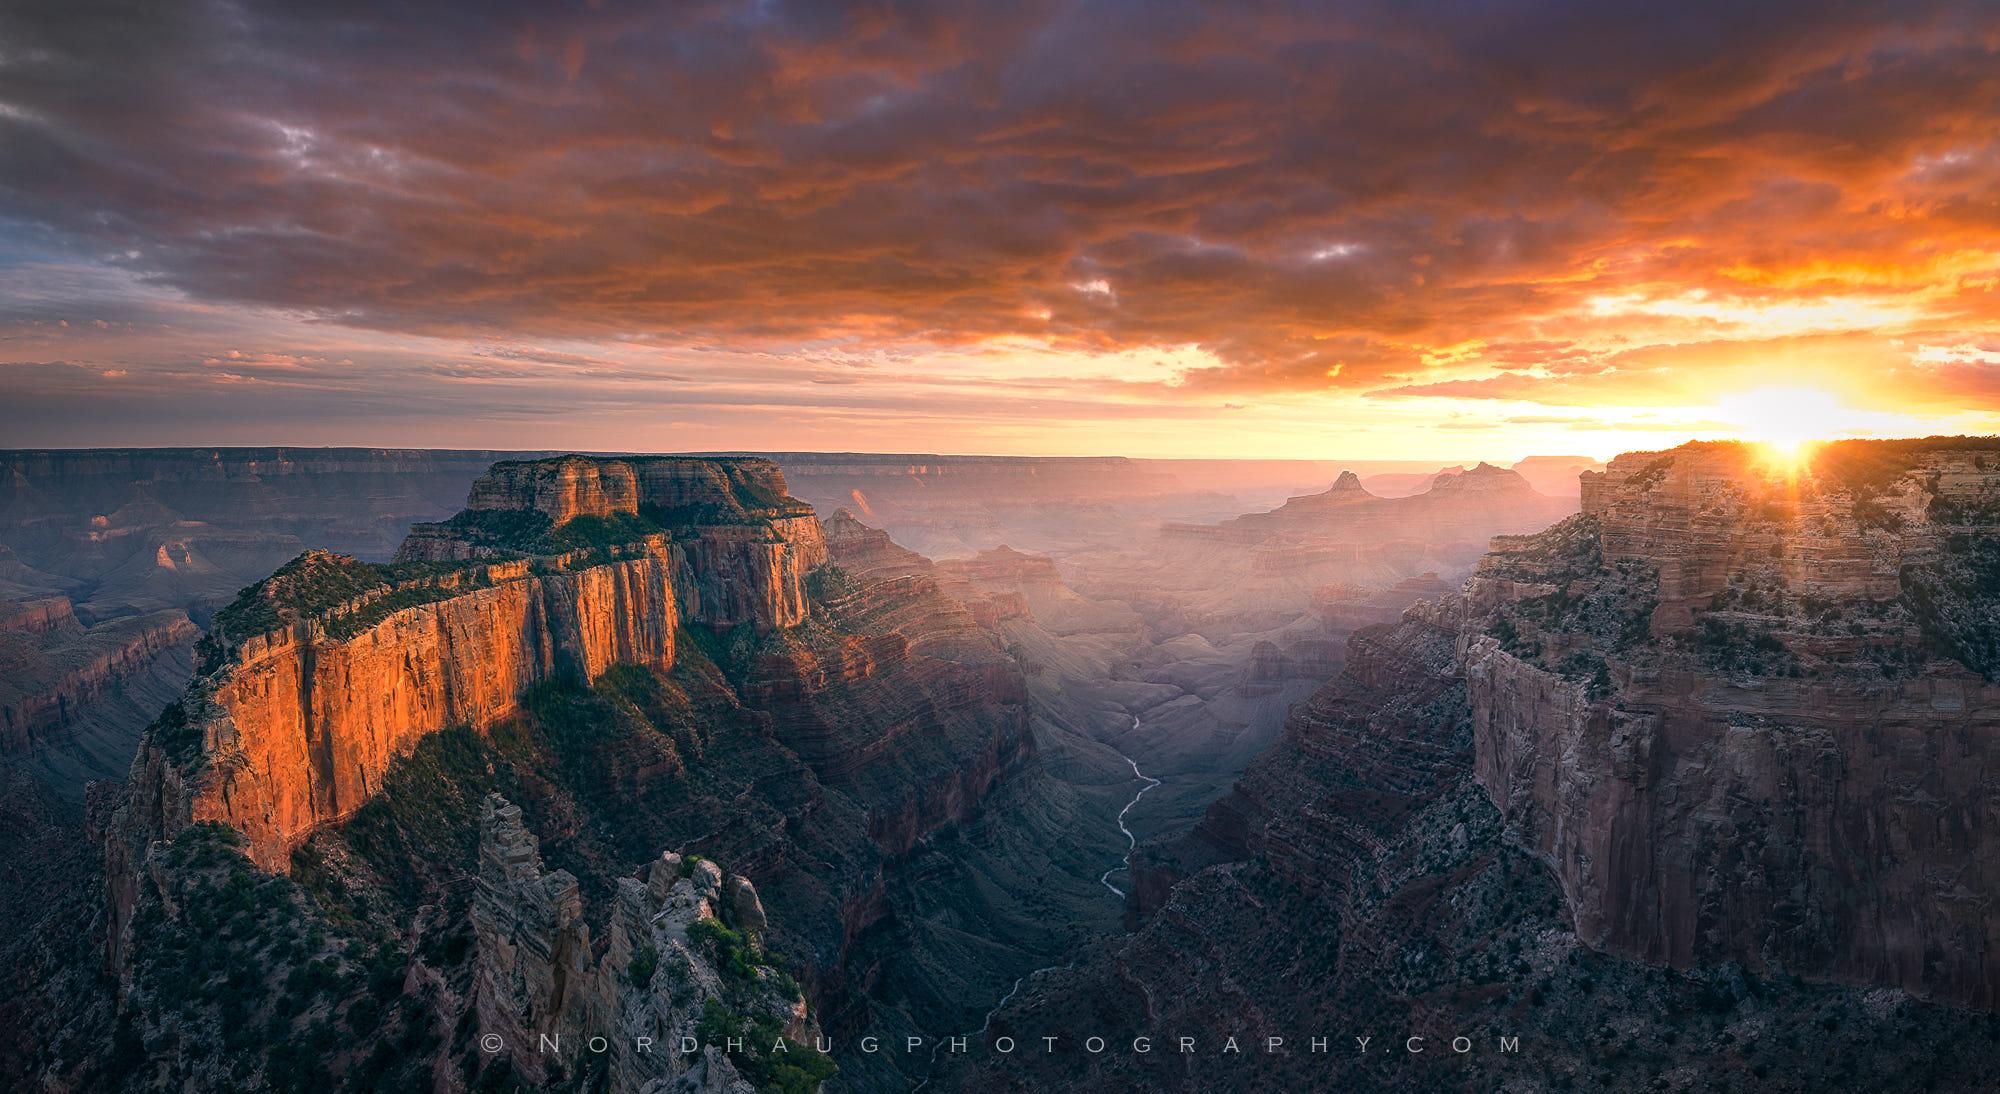 Sunset, Cape Royal, Grand Canyon National Park, USA